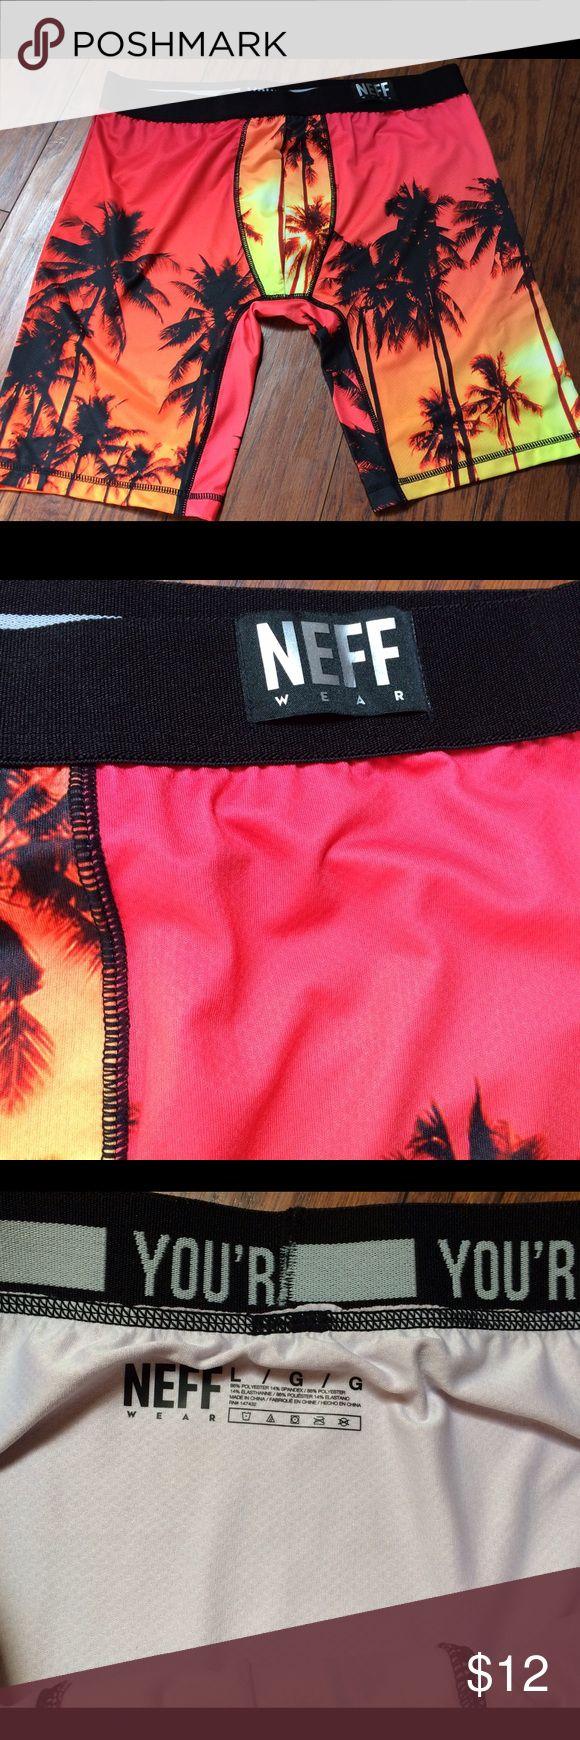 Neff Kevin Durant Tropical Boxers  Underwear Neff Kevin Durant Boxer Underwear size large. Tropical sunset pattern Neff Underwear & Socks Boxers